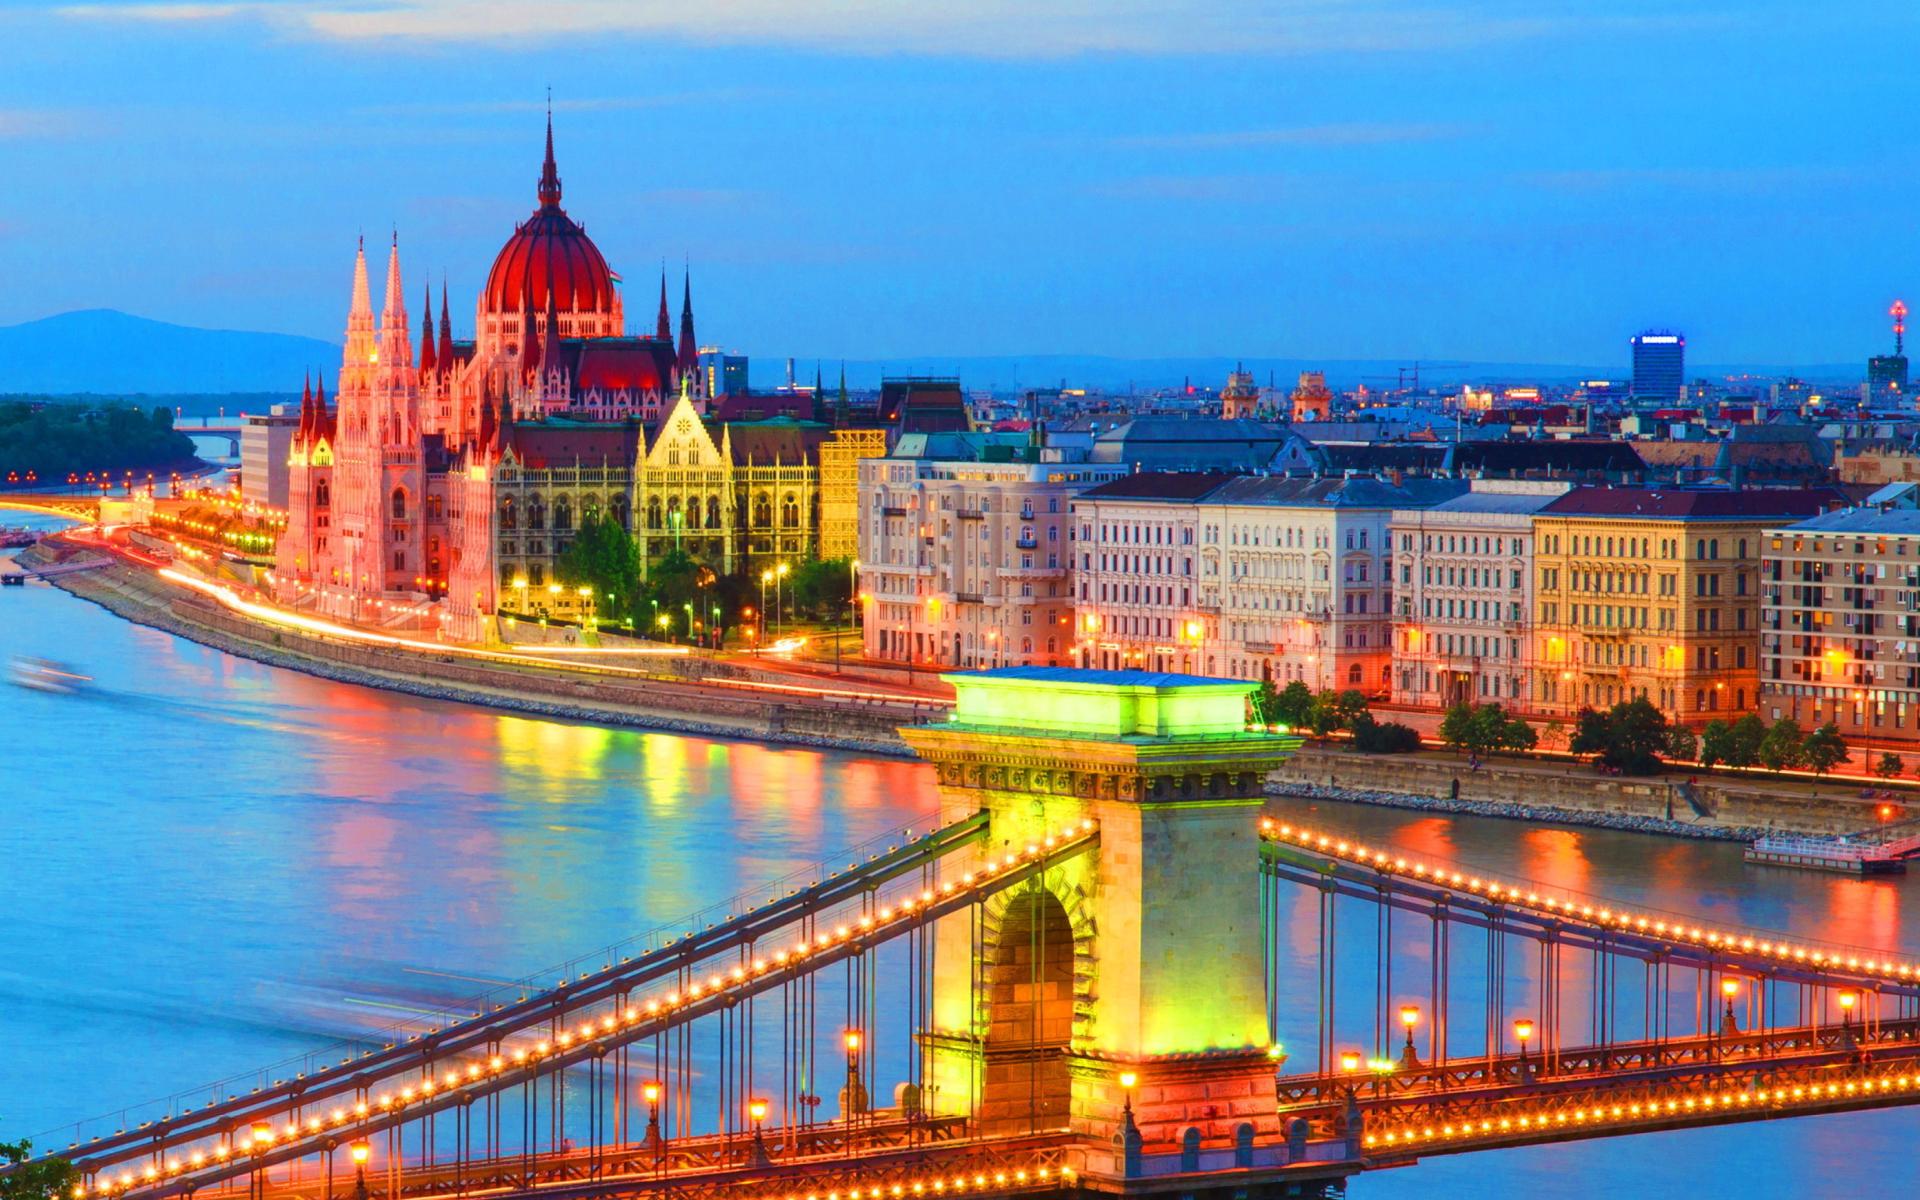 Budapest - Hungarian Parliament Building para Widescreen Desktop PC 1920x1080 Full HD